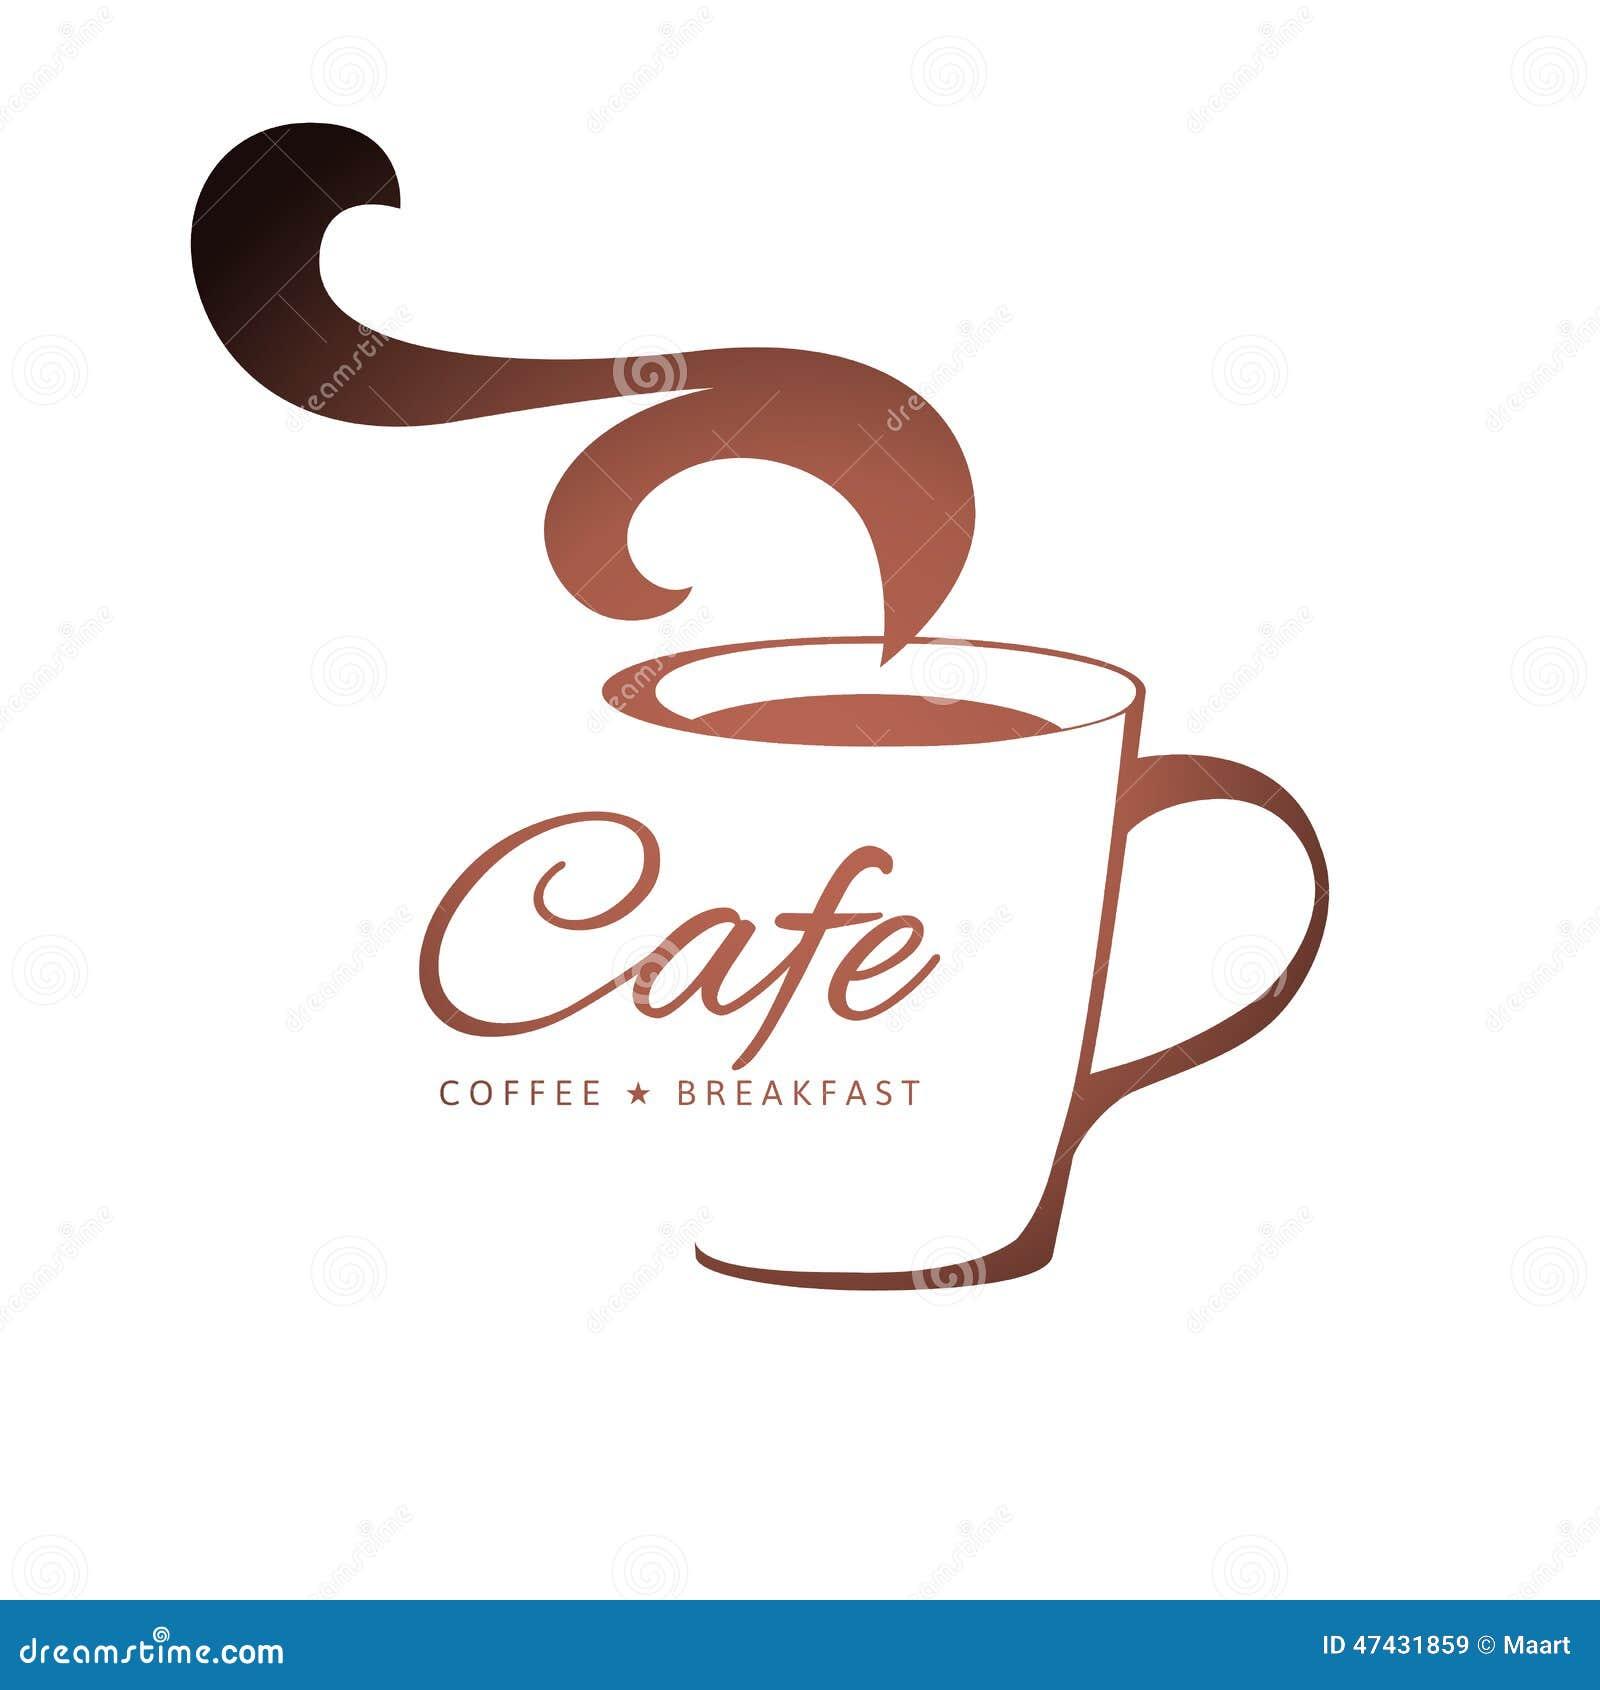 coffee cup logo template - photo #1